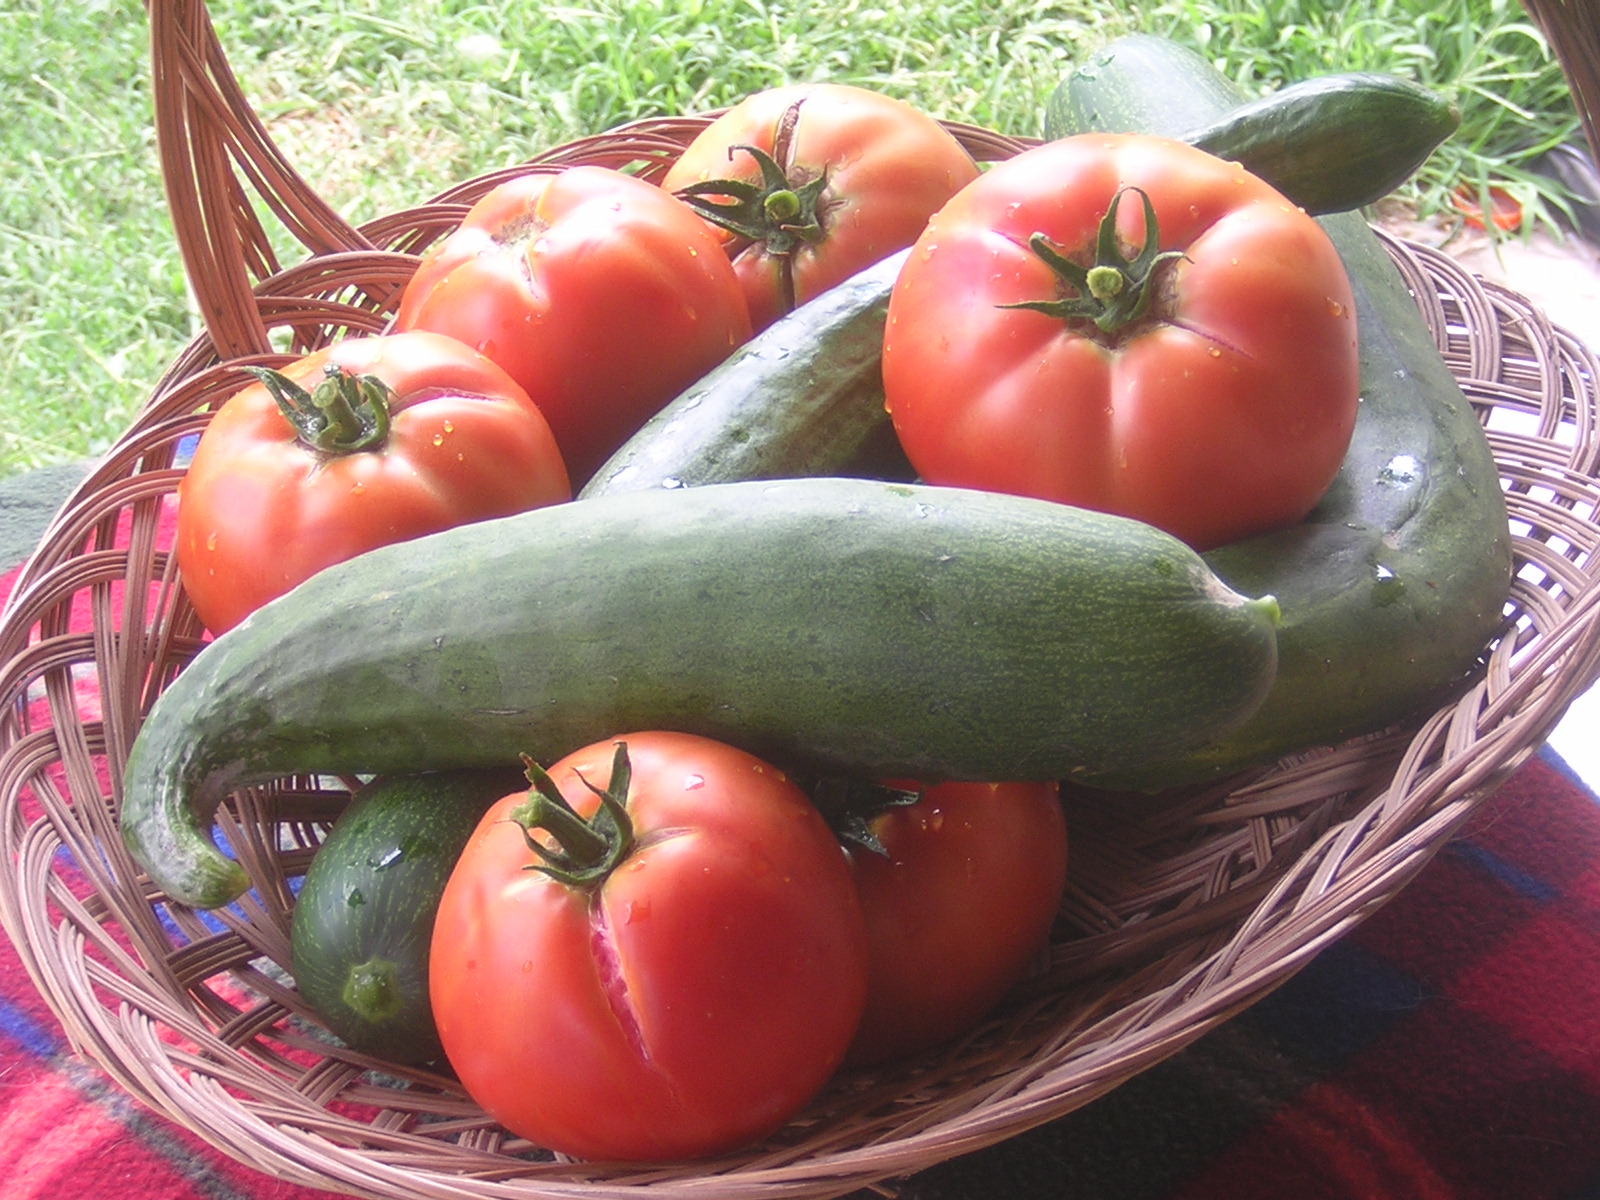 Tomatoe basket